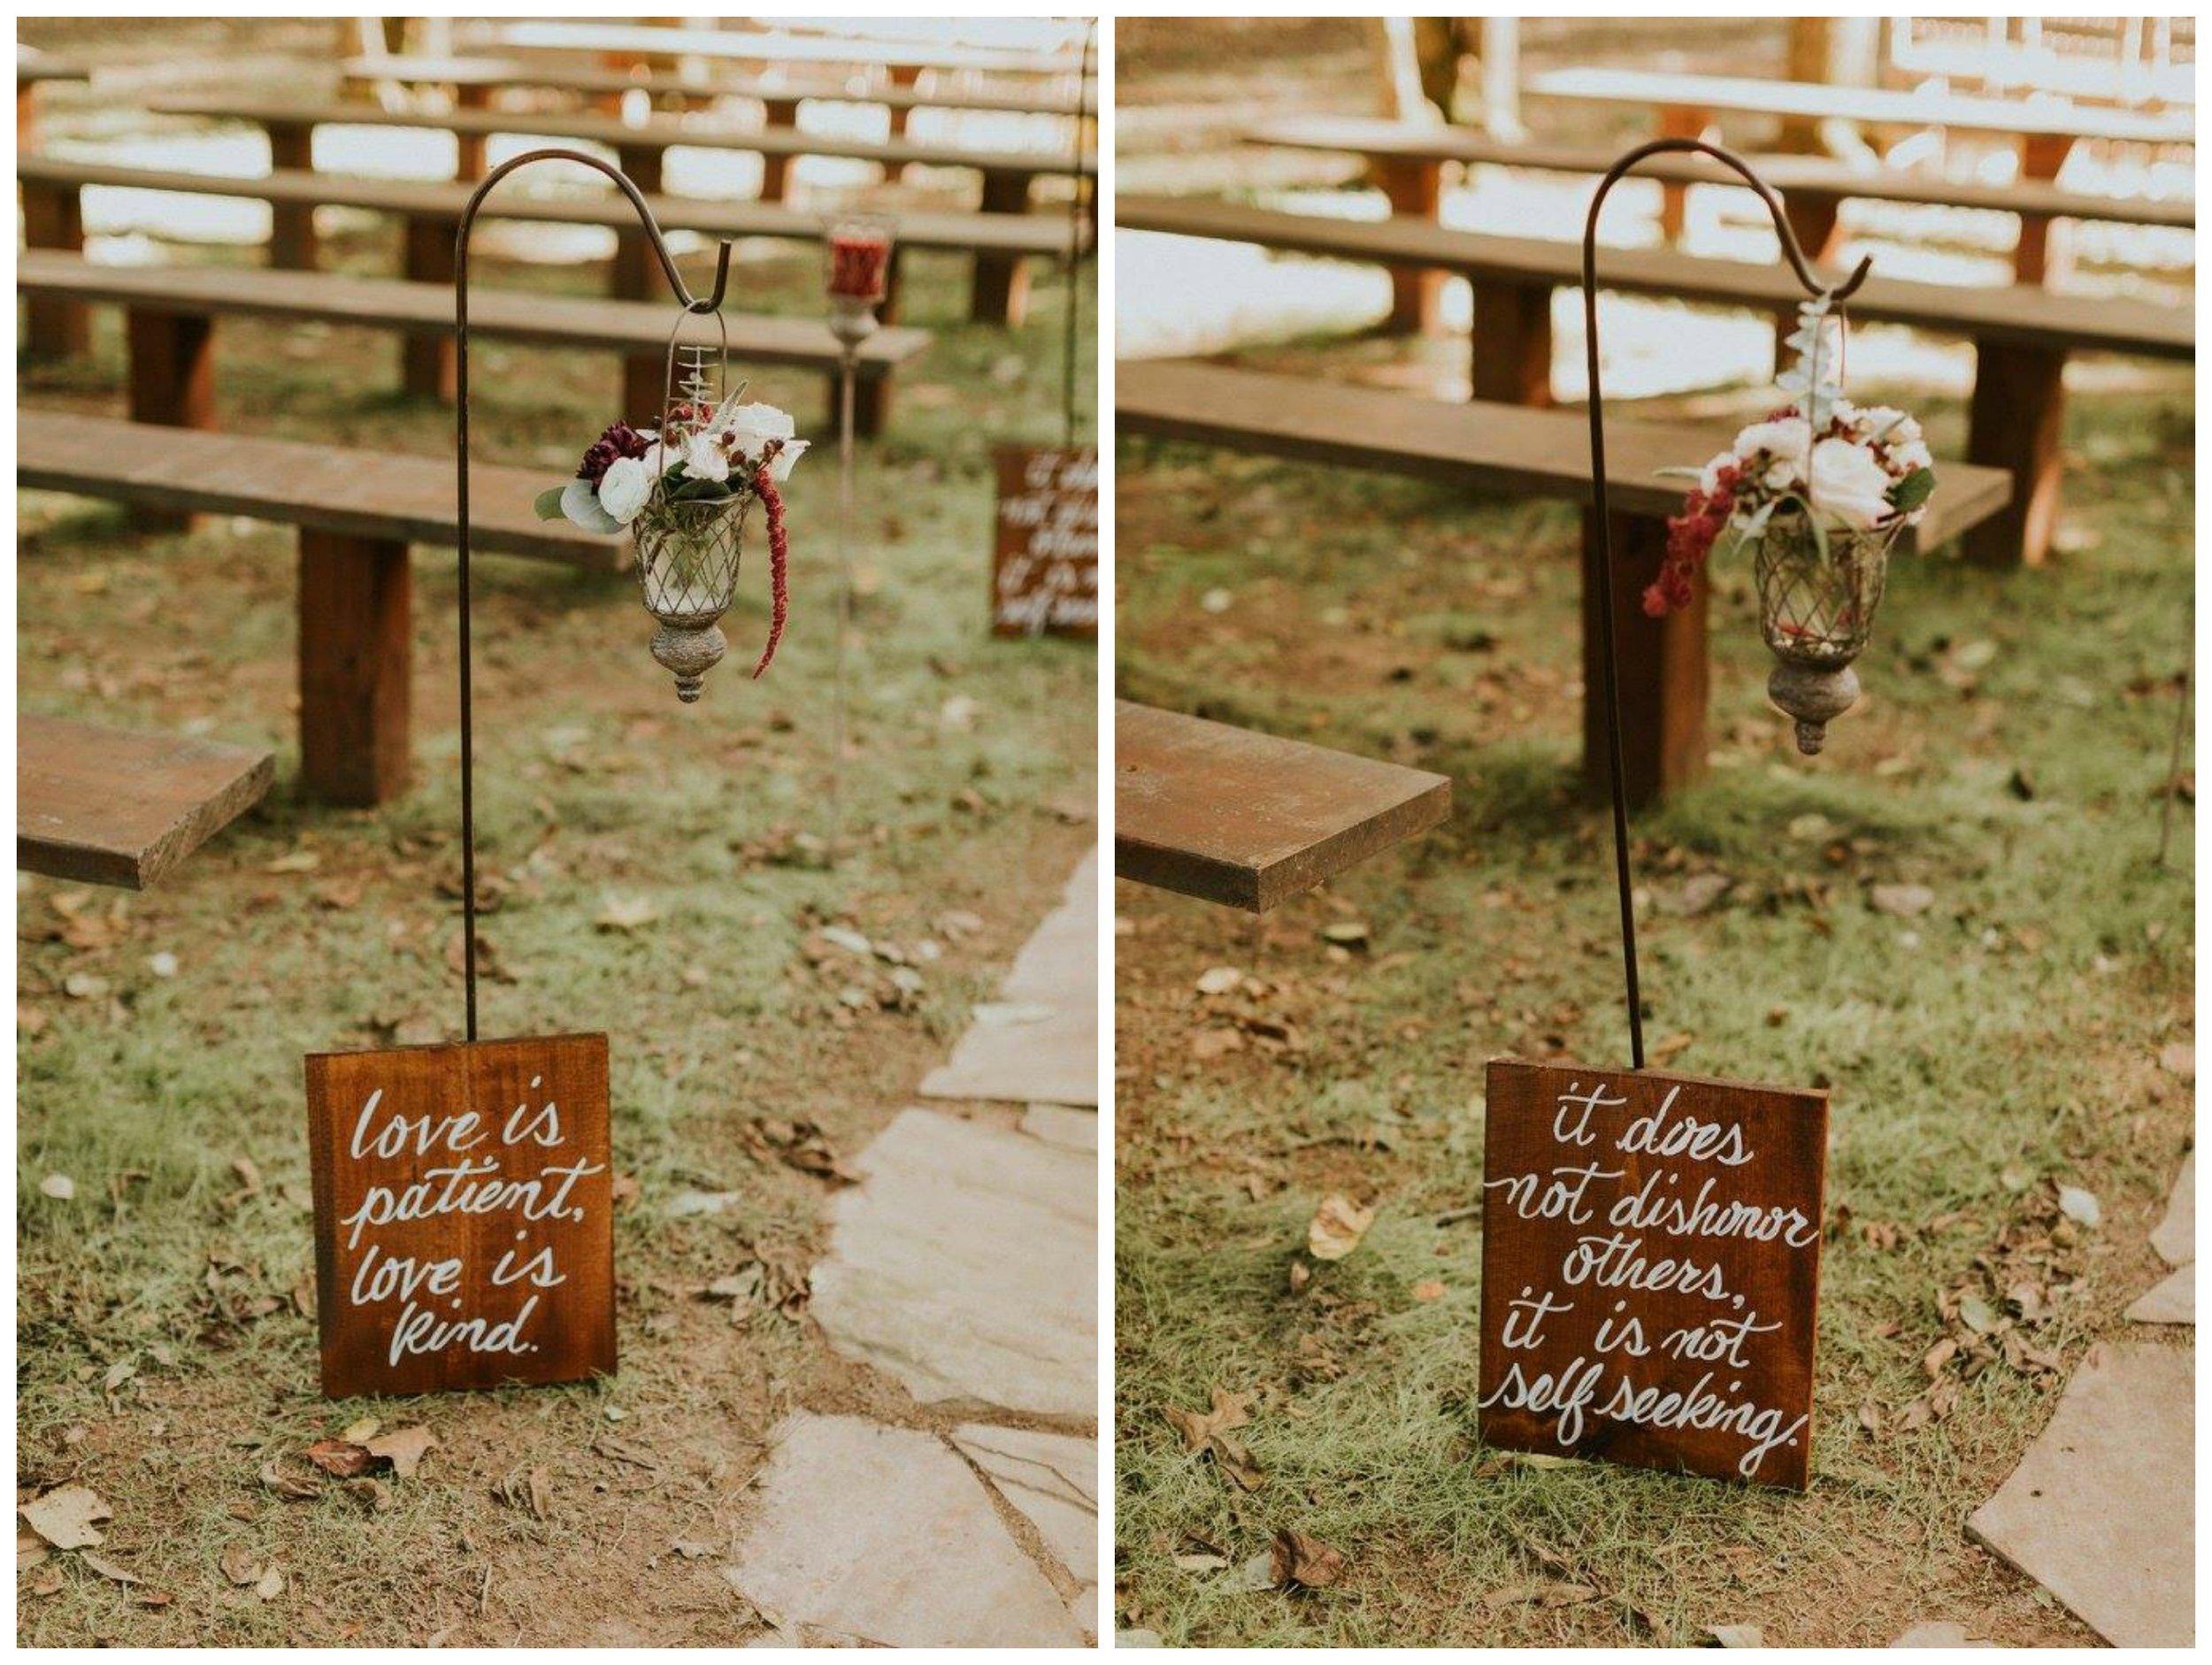 B.Matthews Creative , from  Holly + Caleb 's wedding at The Barn